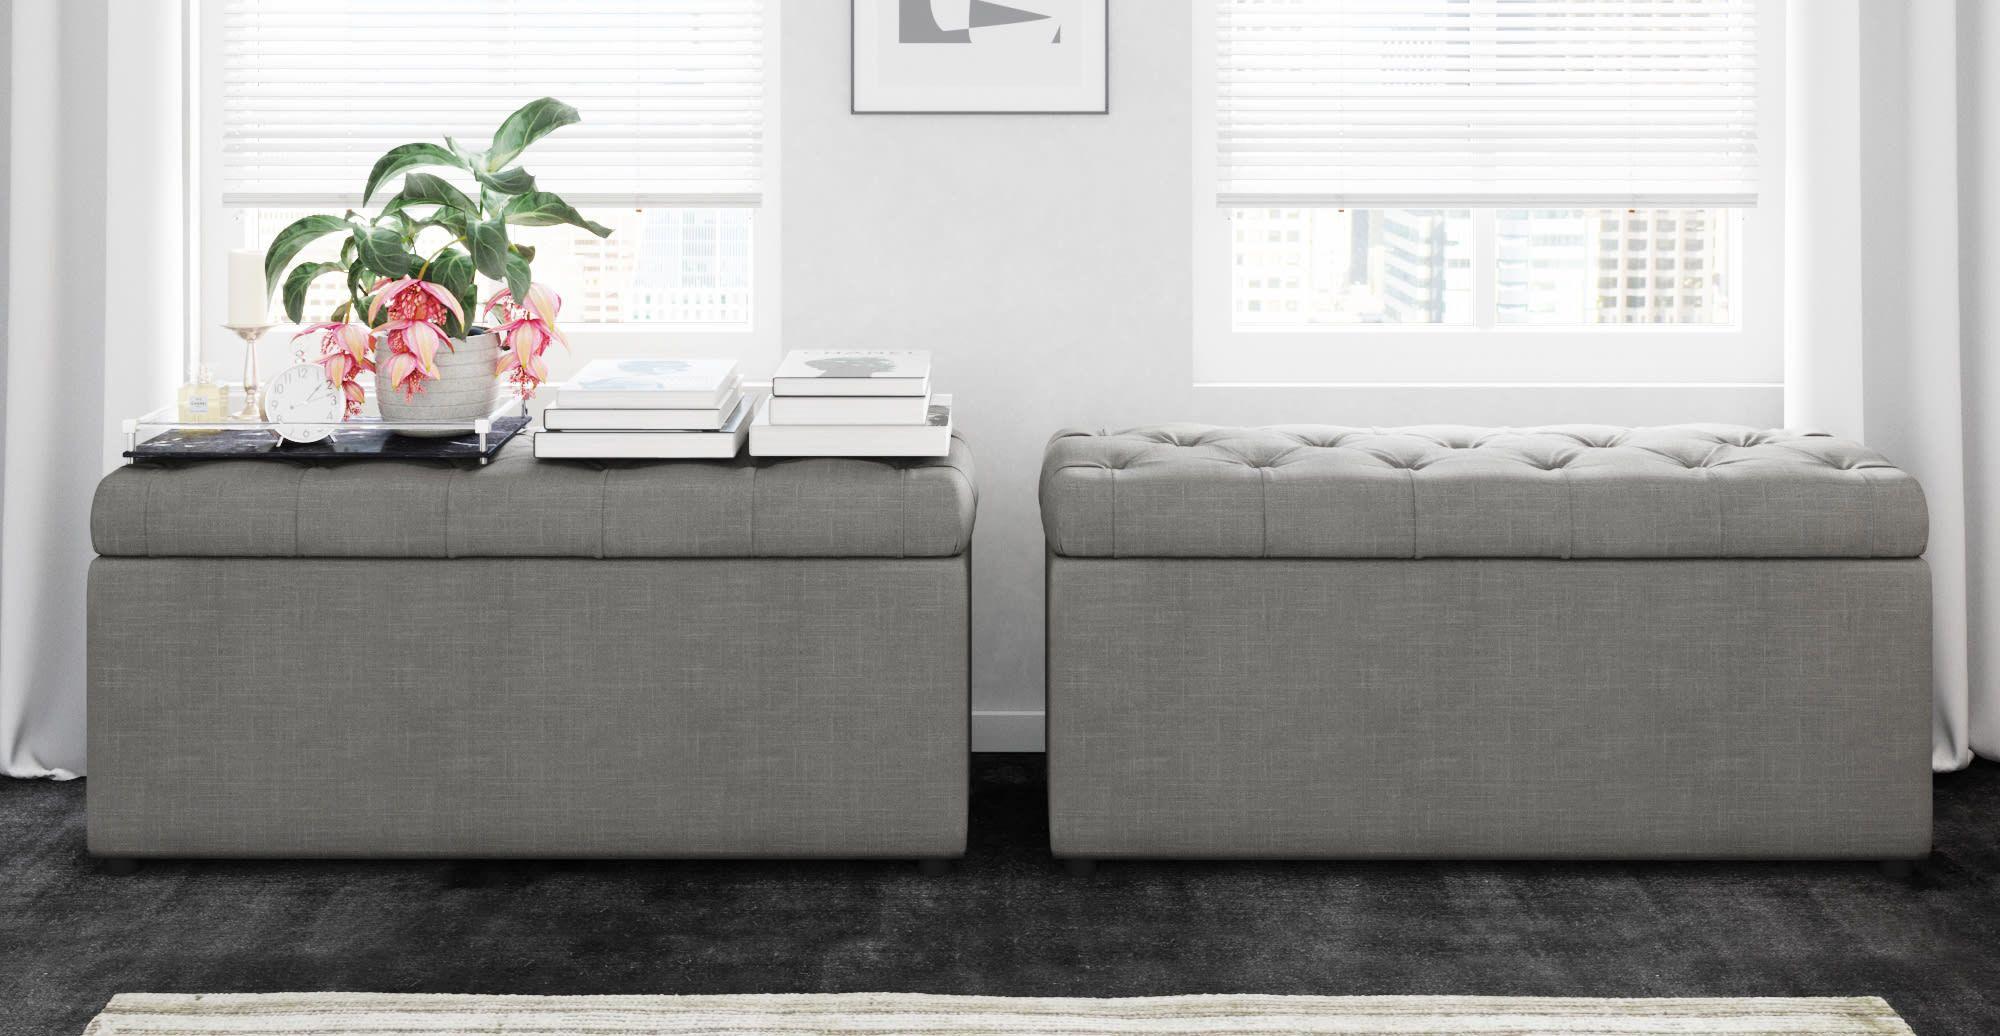 Tremendous Emily Storage Ottoman In 2019 Peggy Facelift Storage Creativecarmelina Interior Chair Design Creativecarmelinacom